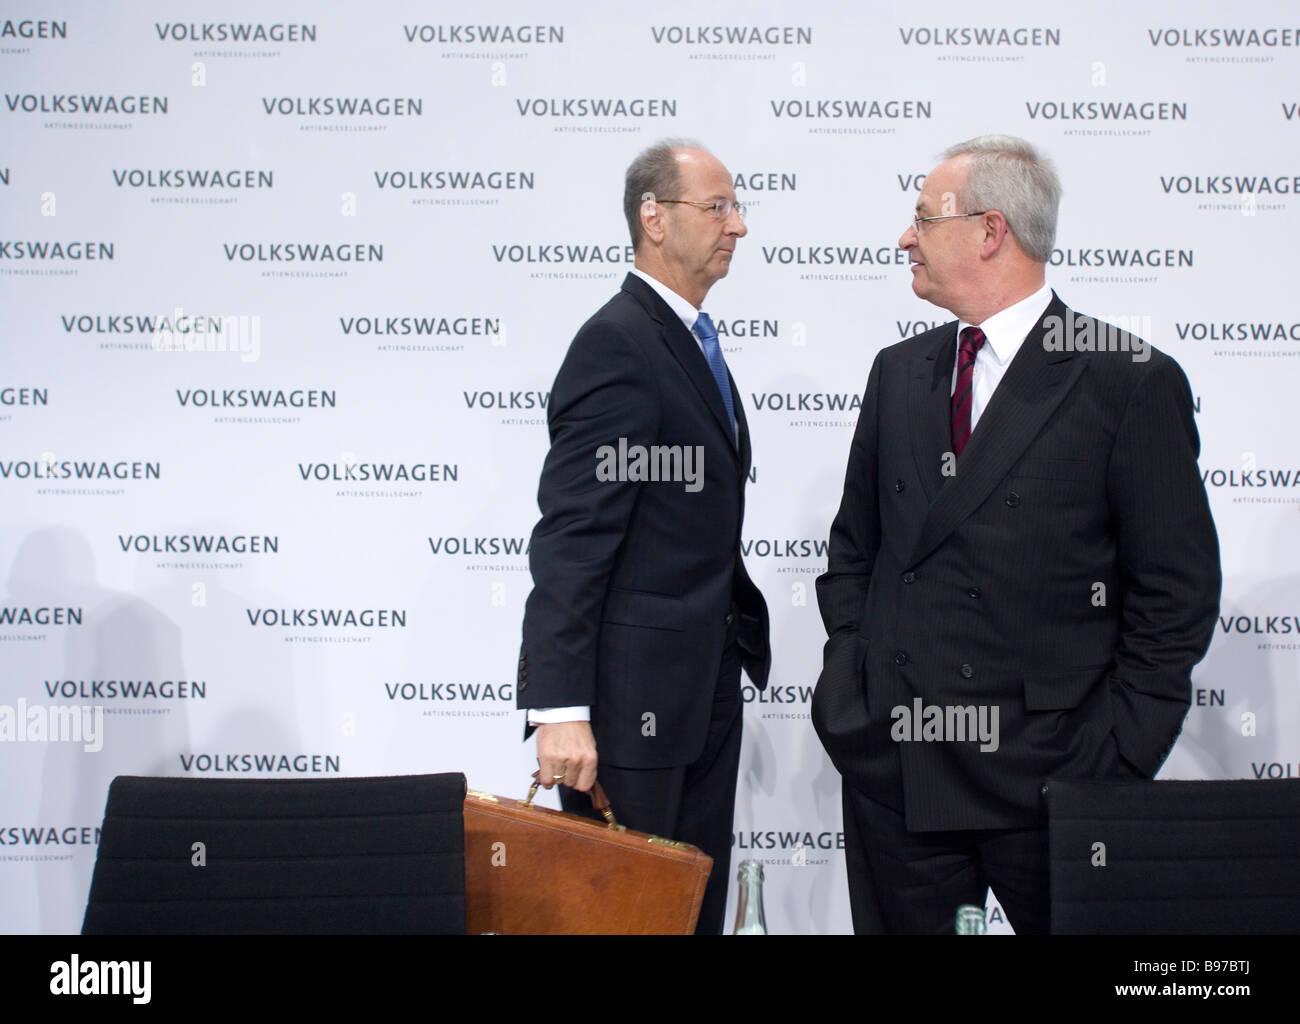 Prof Dr Martin Winterkorn and Hans Dieter Poetsch - Stock Image